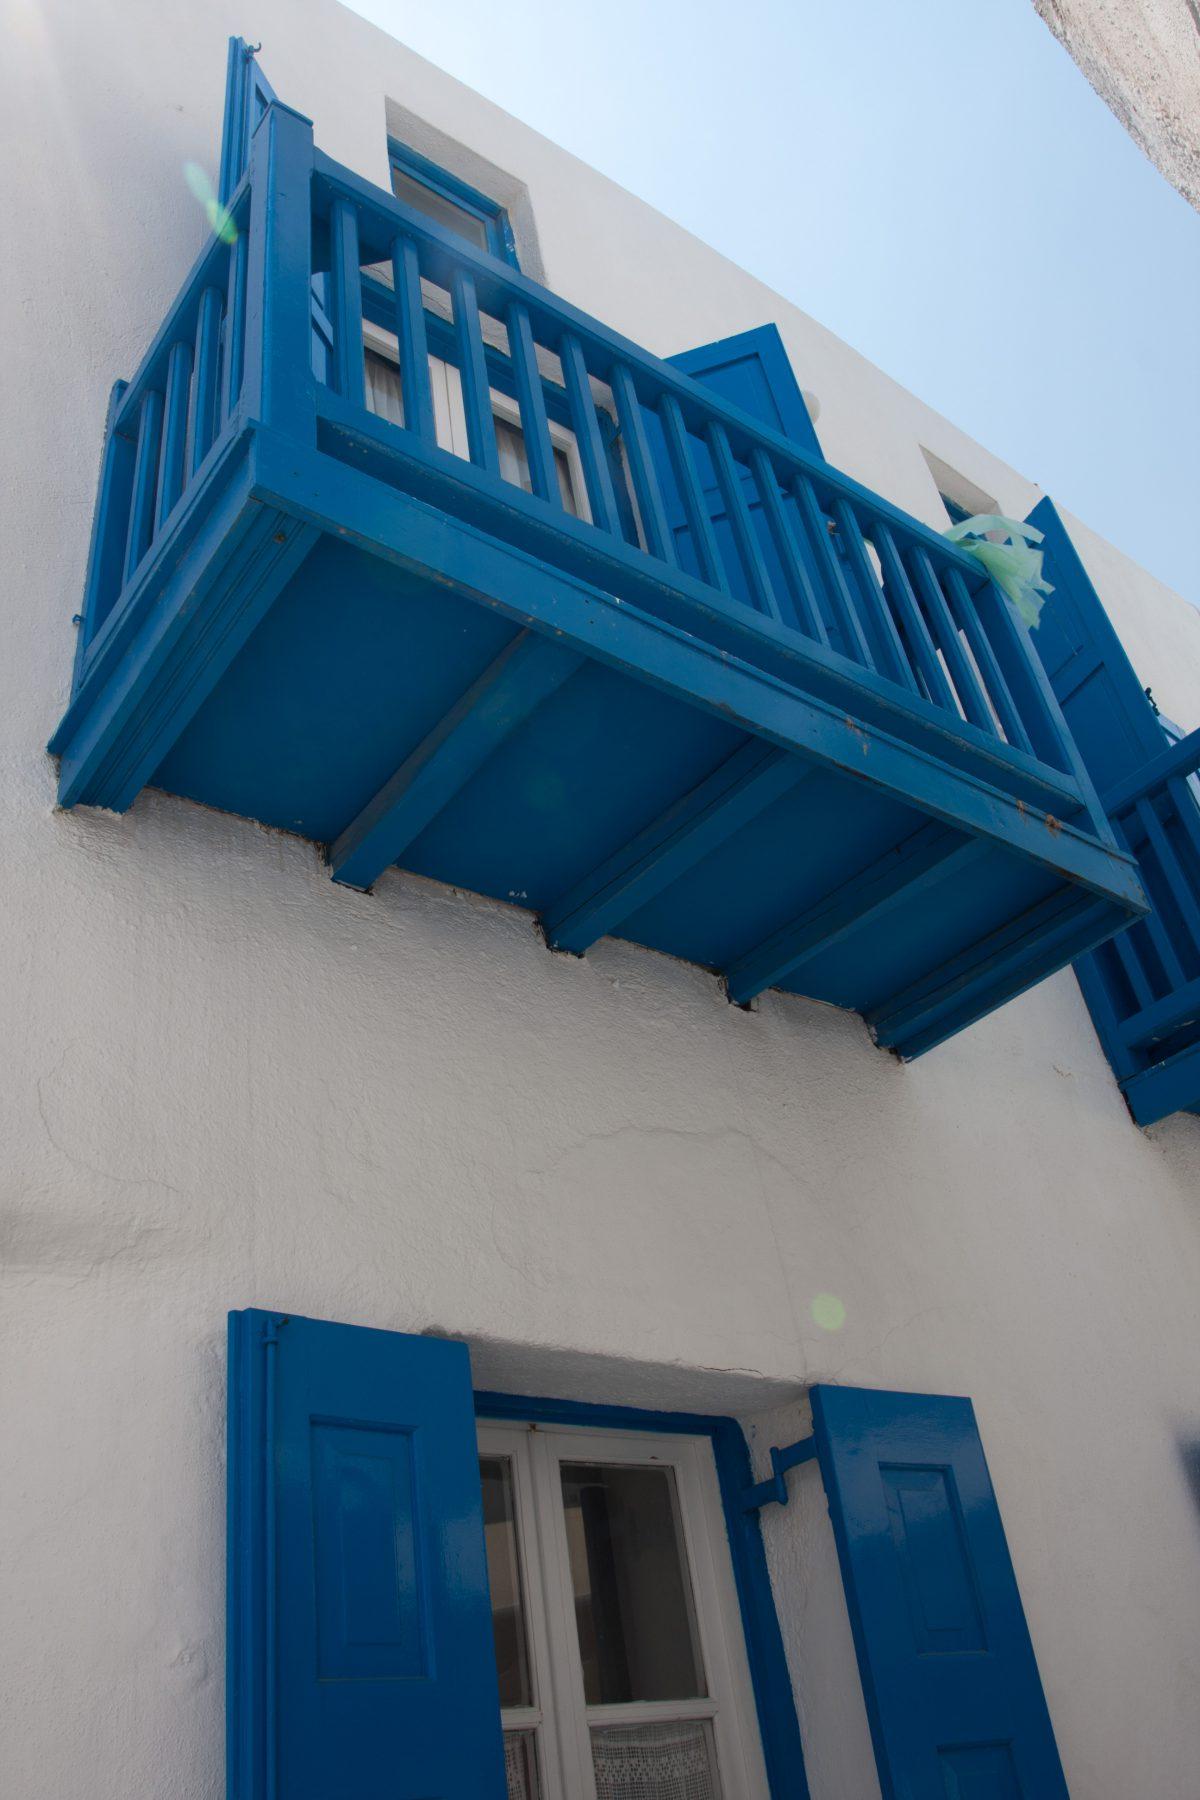 alley, balcony